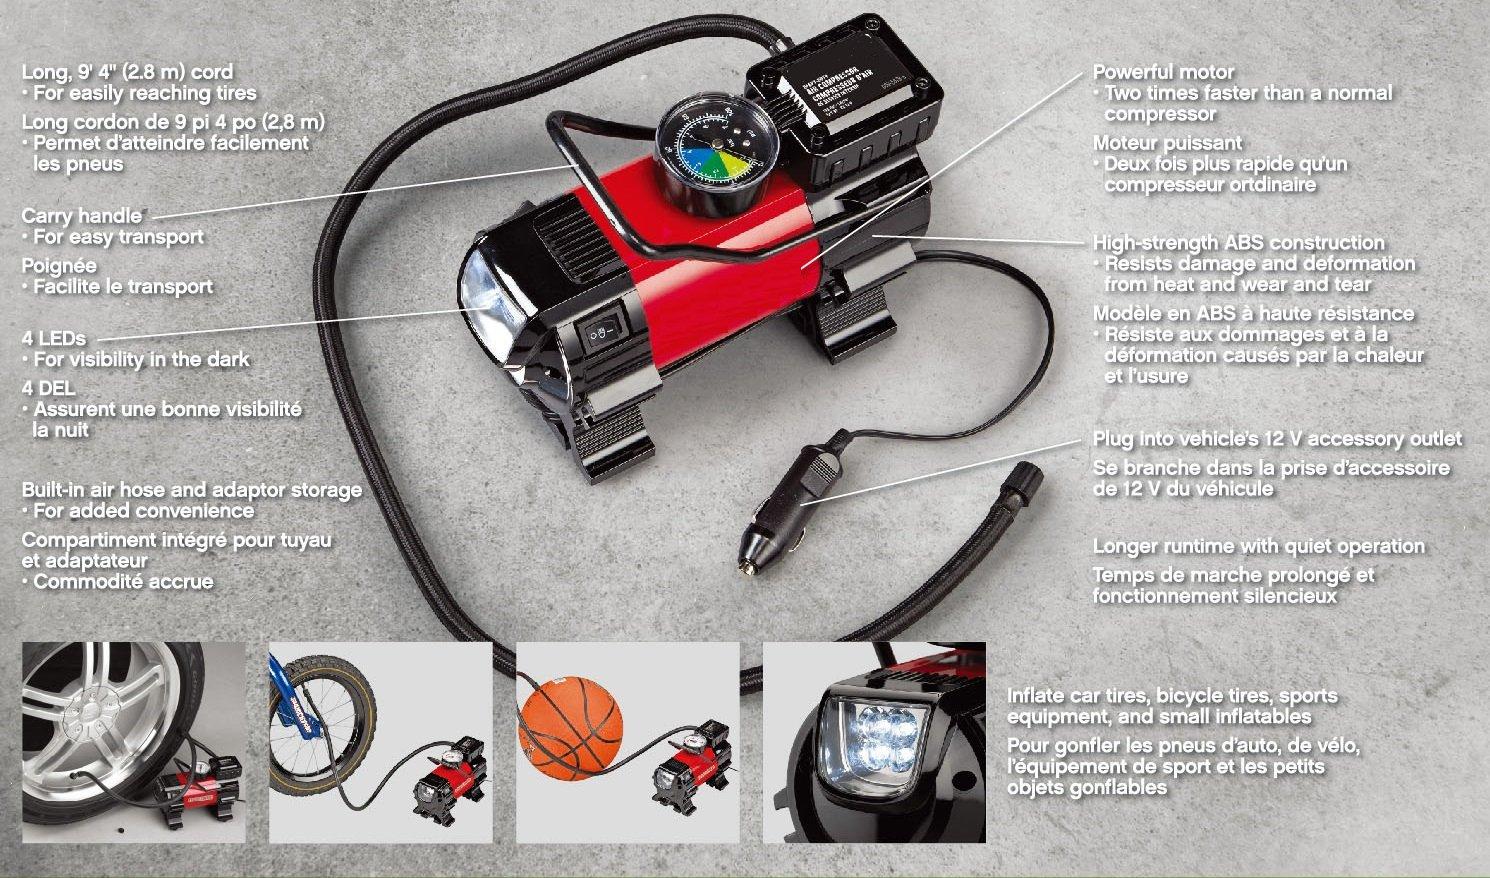 Air Compressor Car: HEAVY DUTY Portable Air Compressor For Car Tire Pump